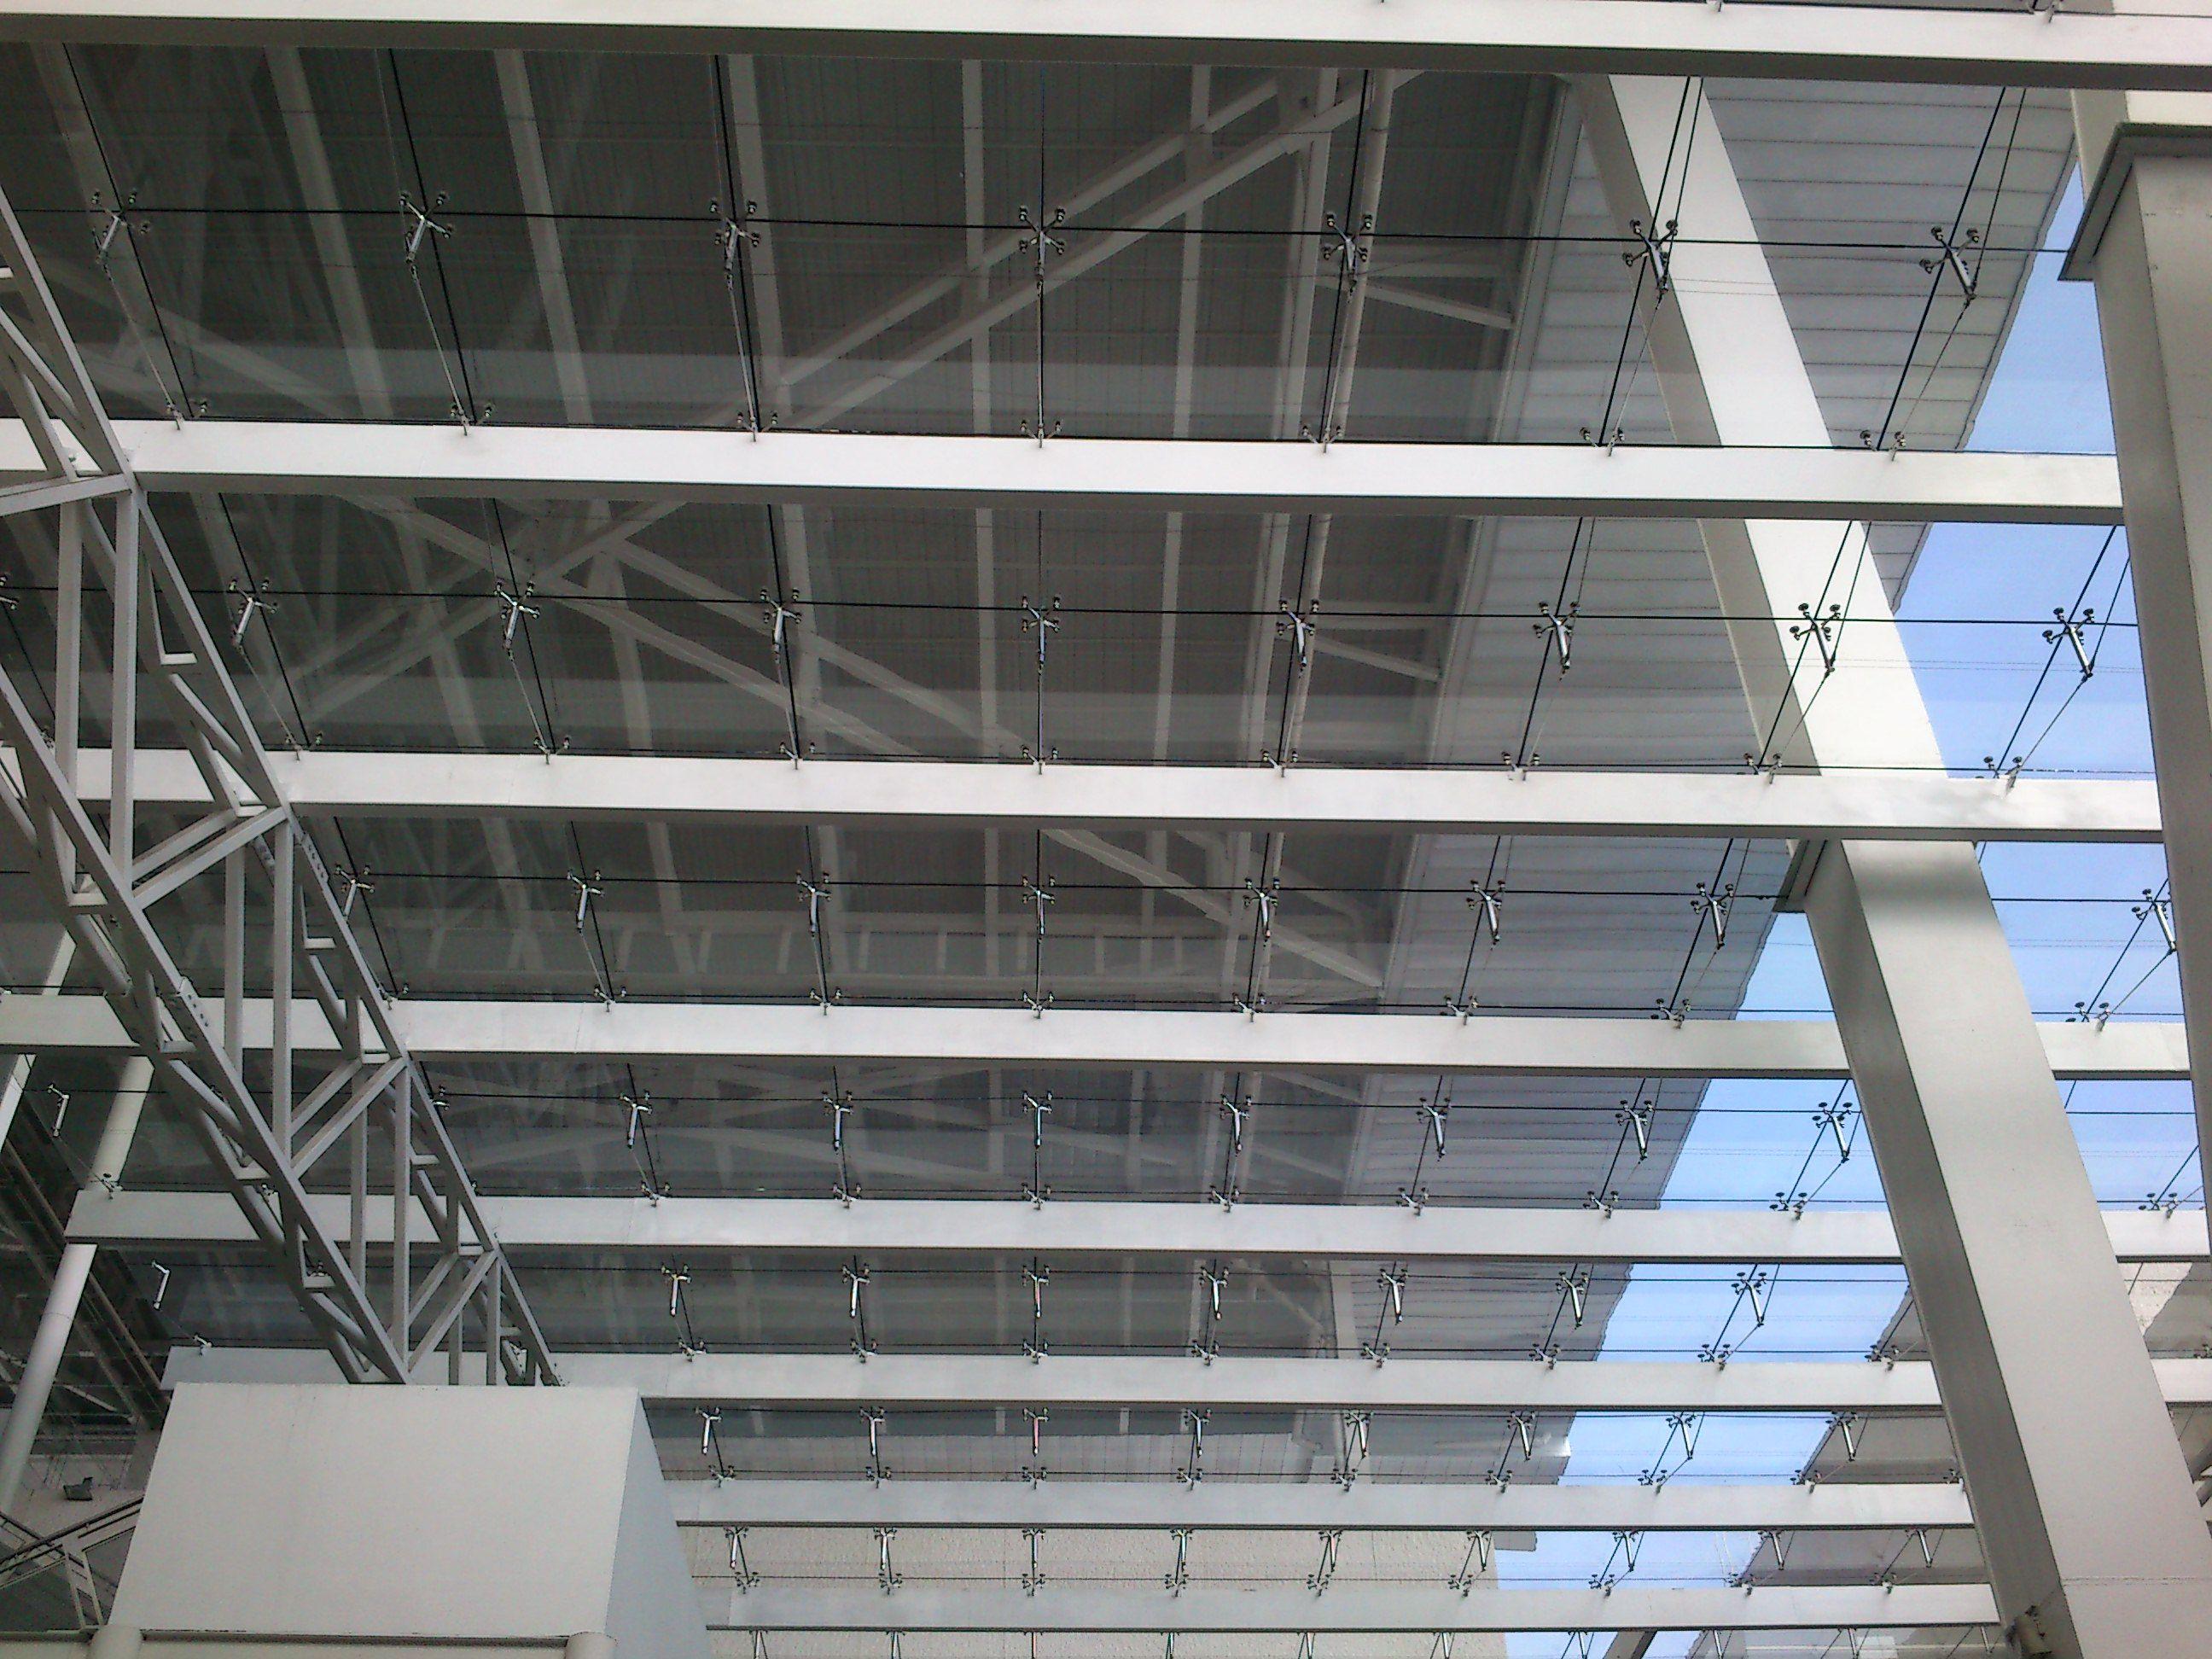 Cubierta de vidrio laminado arquitectura obras propias vidrio vidrio laminado y techo de vidrio - Cubierta de cristal ...